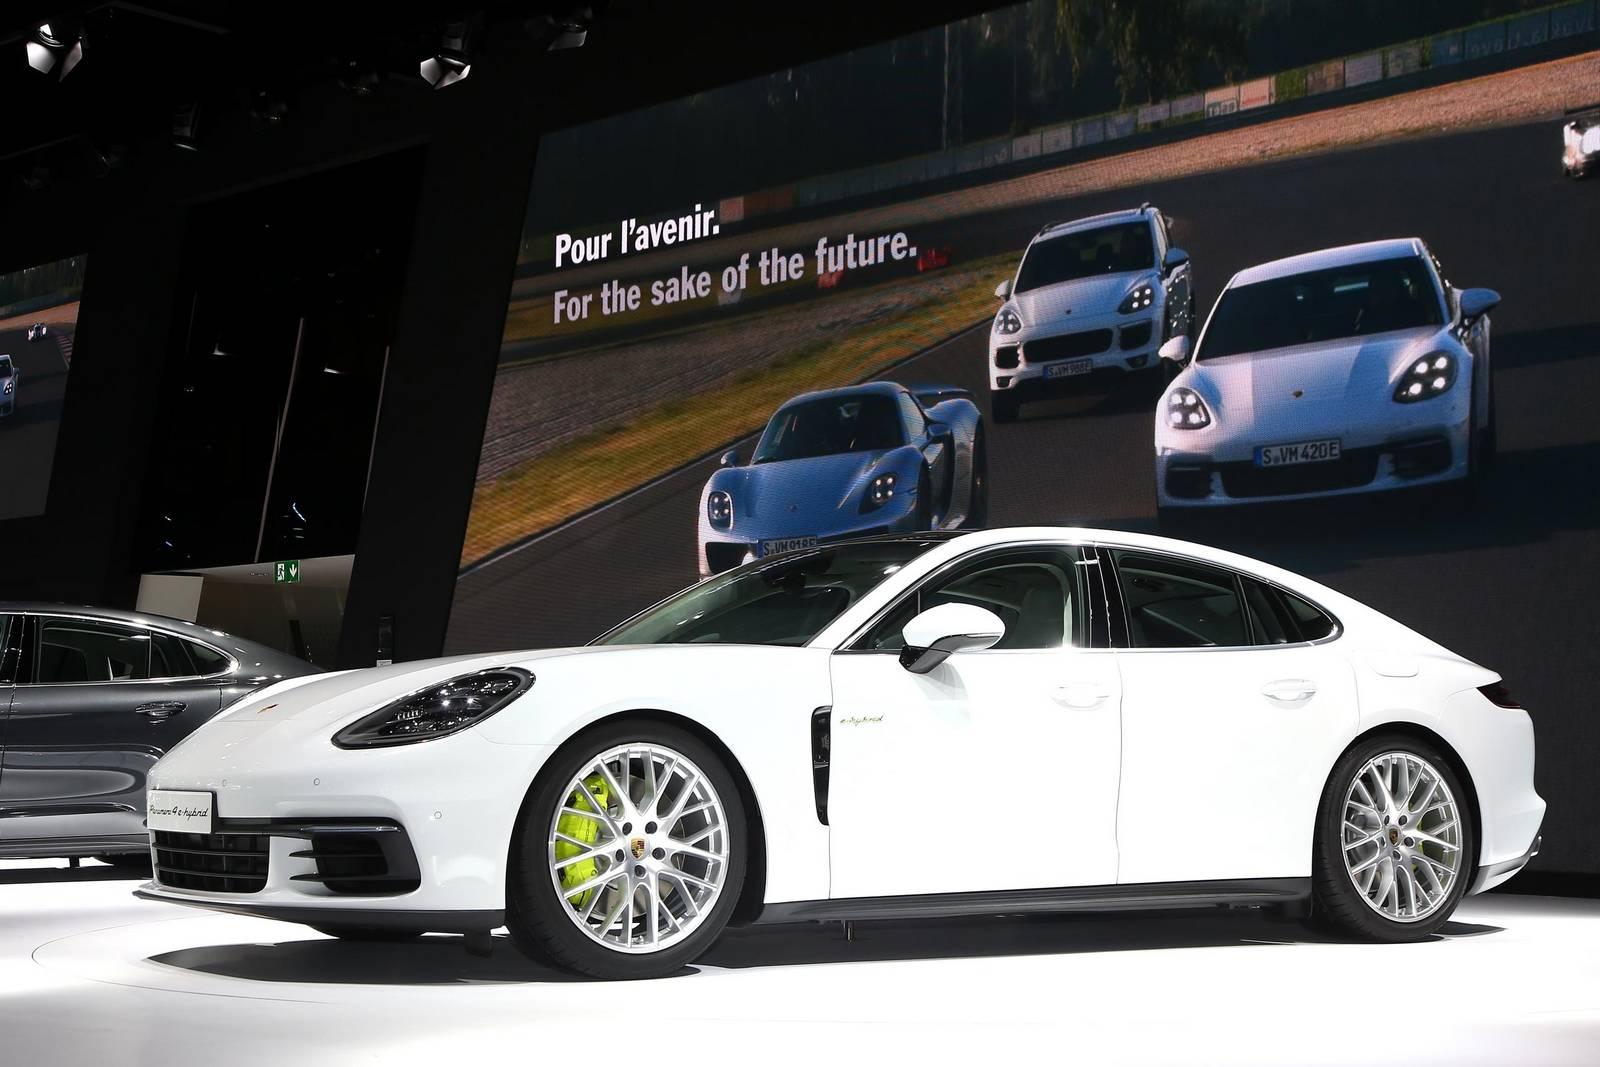 Paris 2016 Porsche Panamera 4s E Hybrid Gtspirit